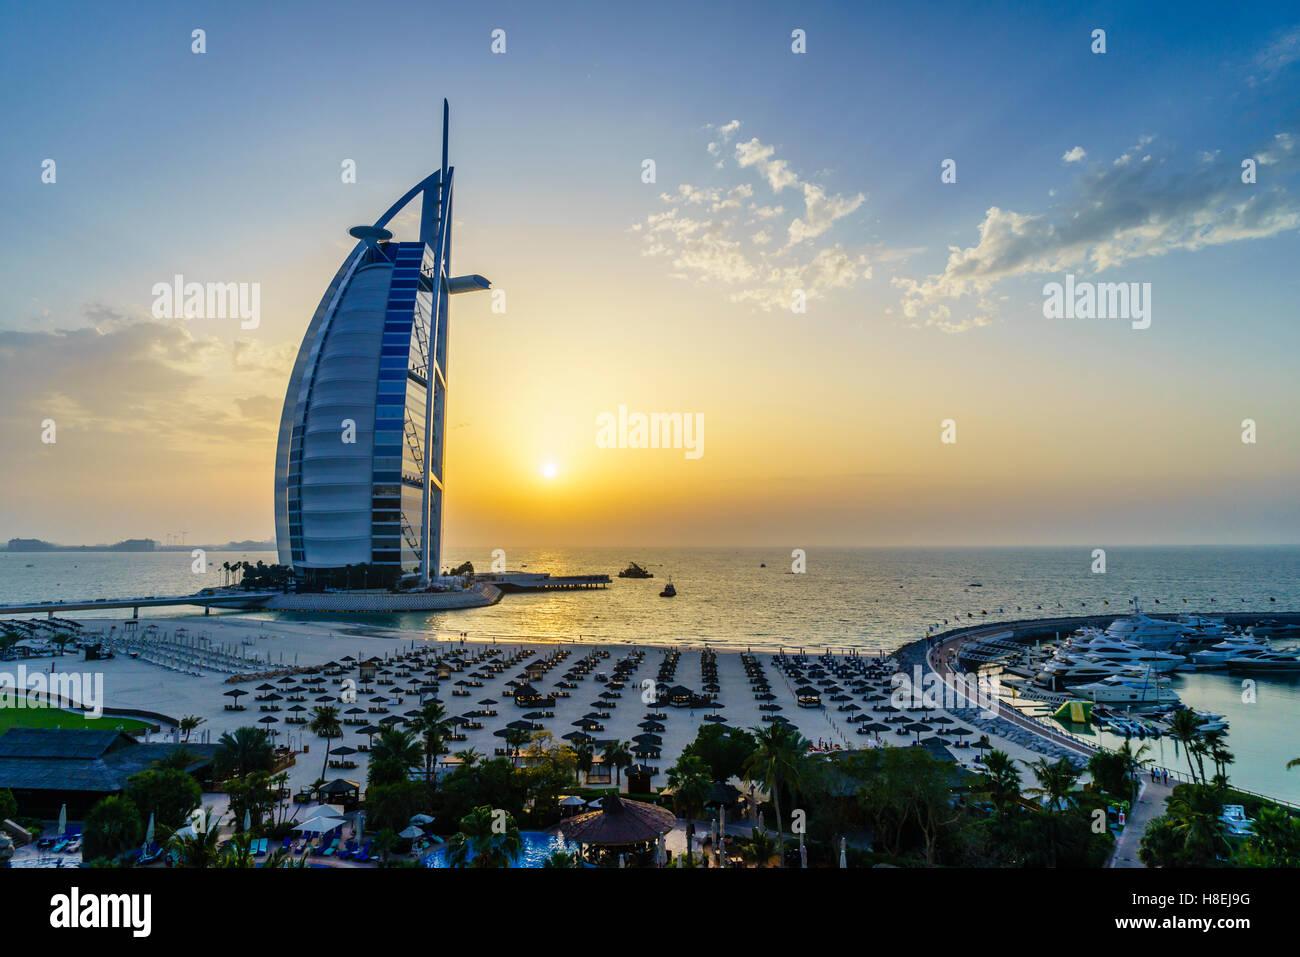 Burj Al Arab, Jumeirah Beach bei Sonnenuntergang, Dubai, Vereinigte Arabische Emirate, Naher Osten Stockbild